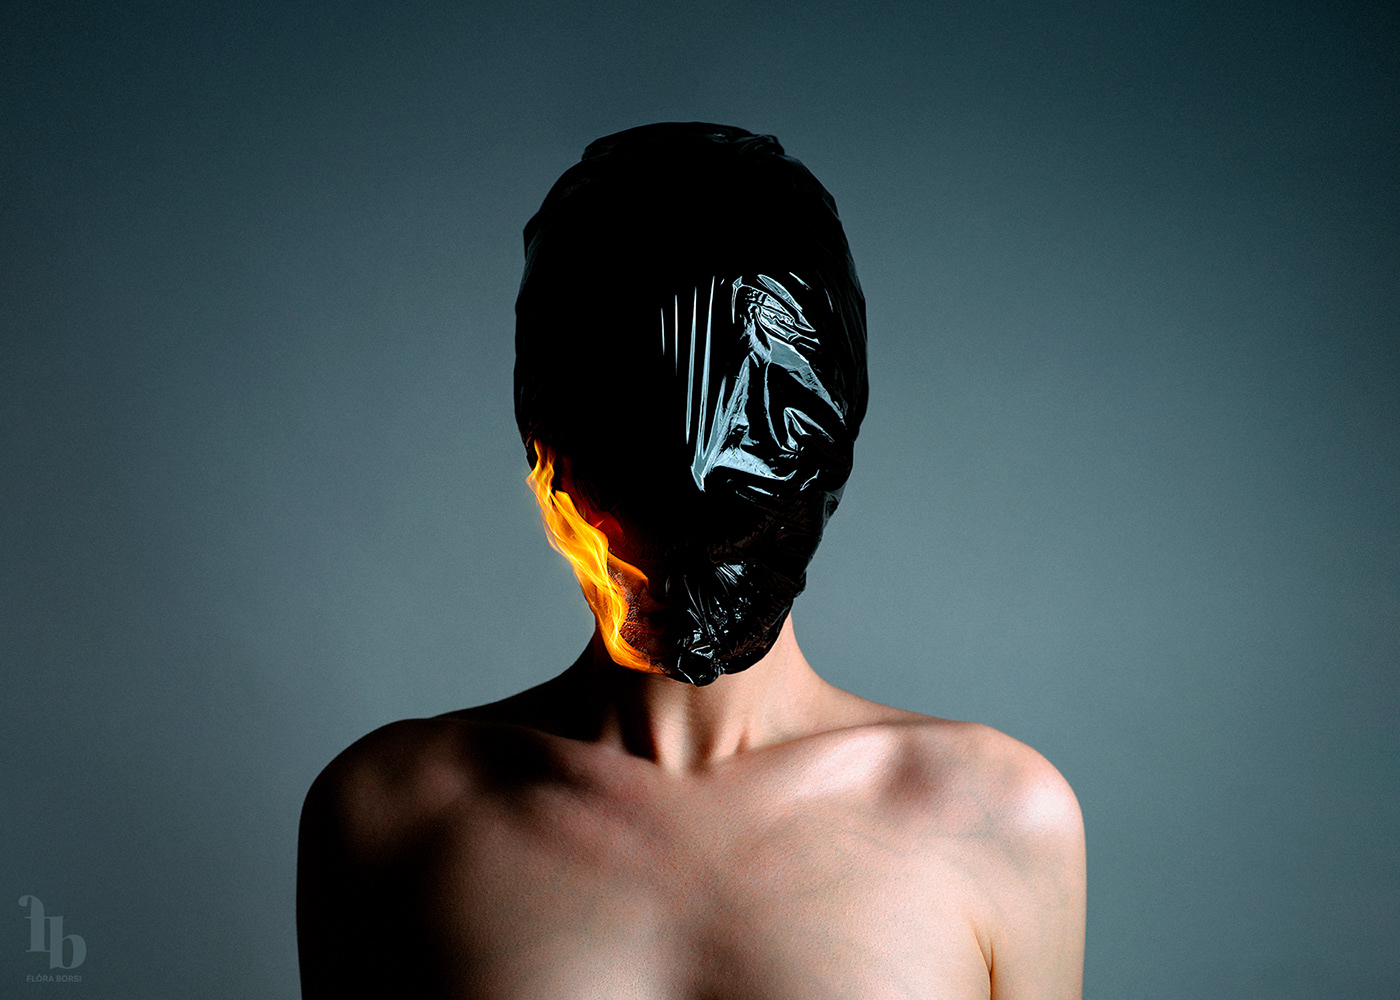 conceptual contemporary fine art Photo Manipulation  Photography  photoshop portrait self portraits surreal